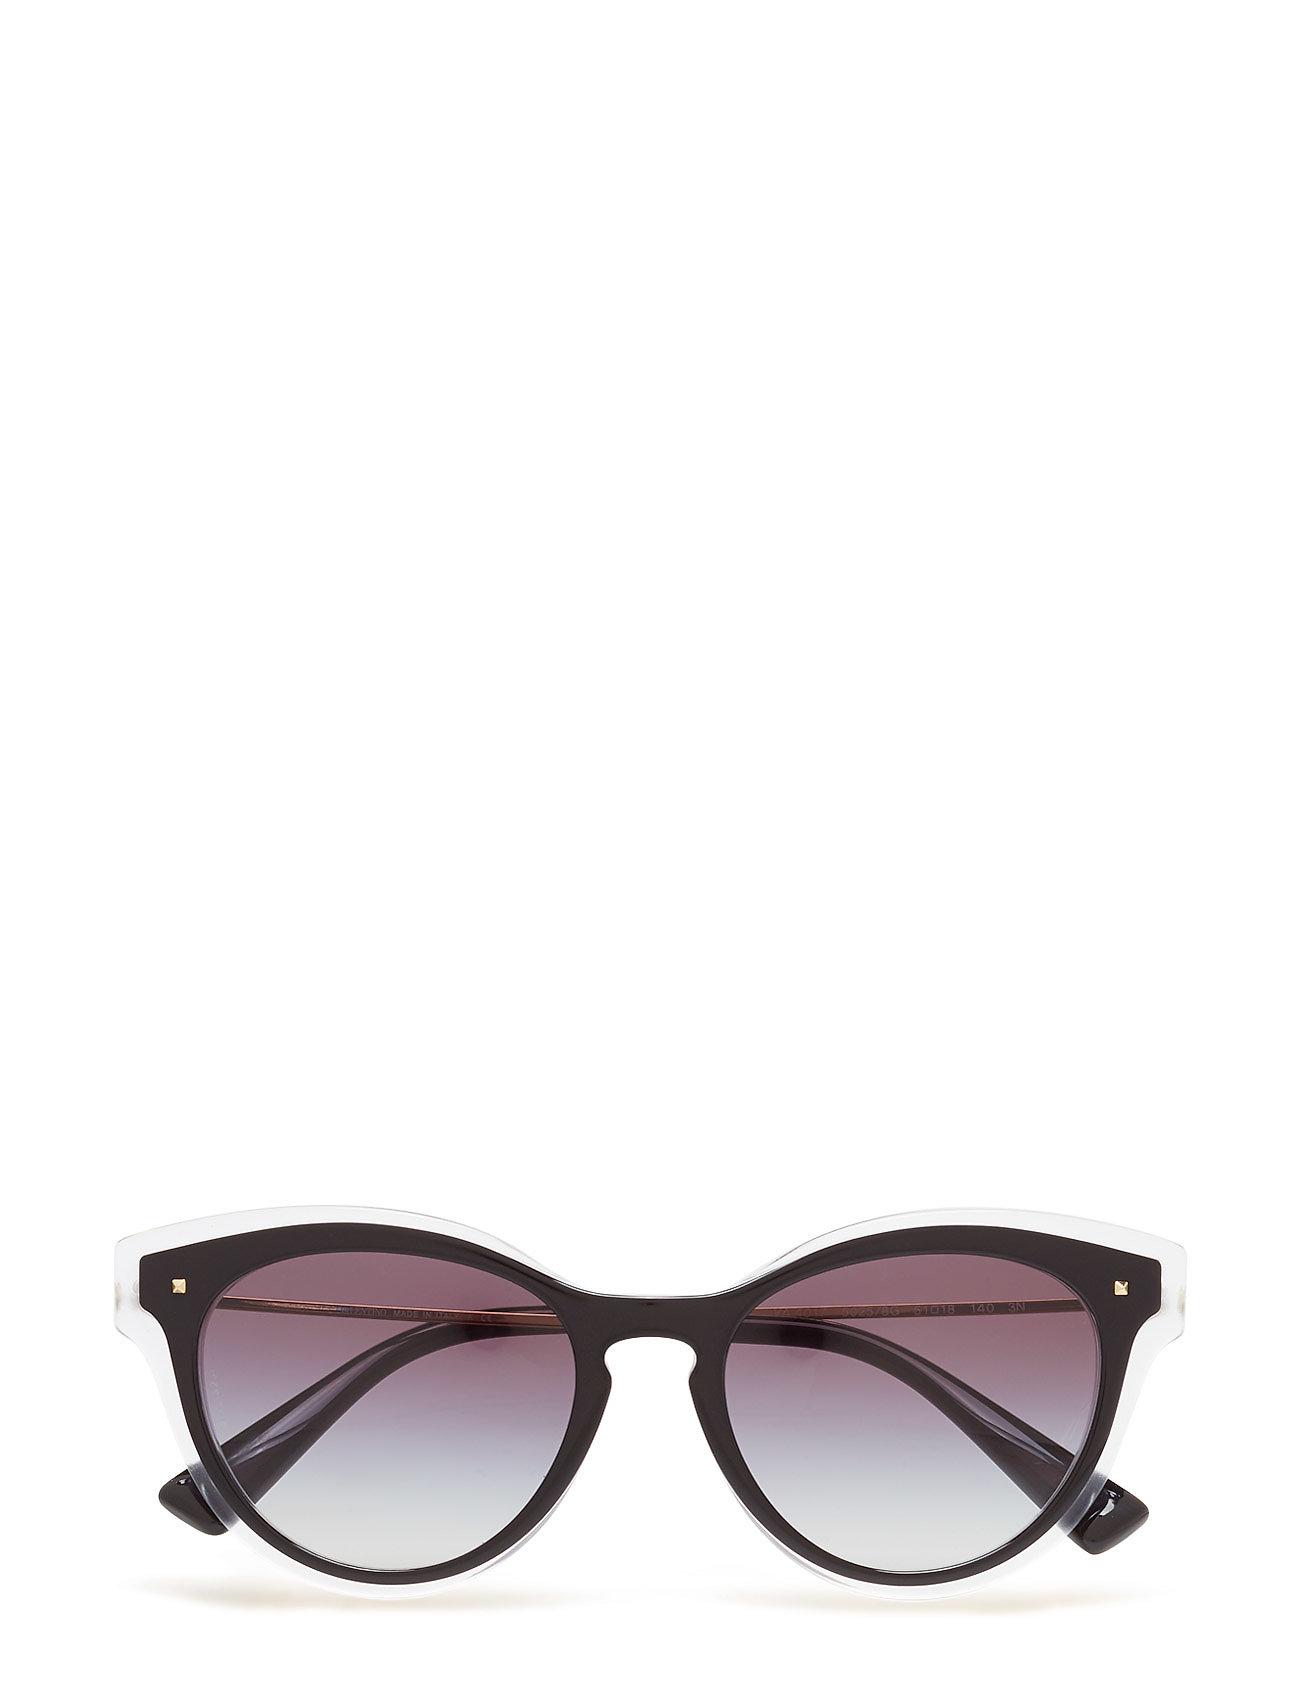 Not Defined - Valentino Sunglasses